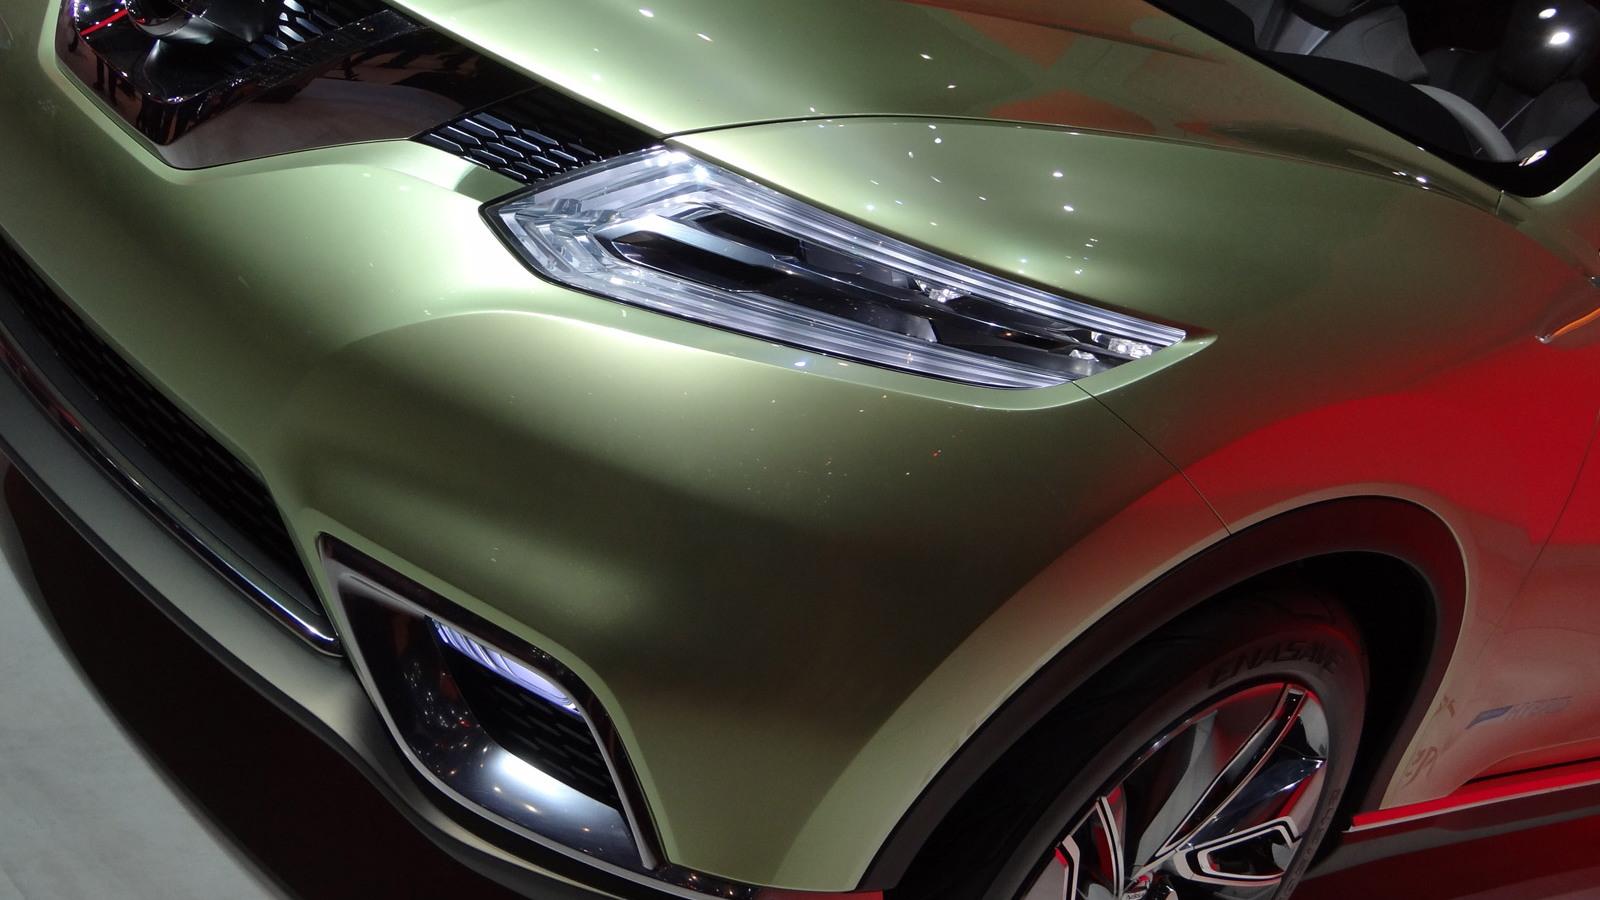 2012 Nissan Hi-Cross Concept live photos